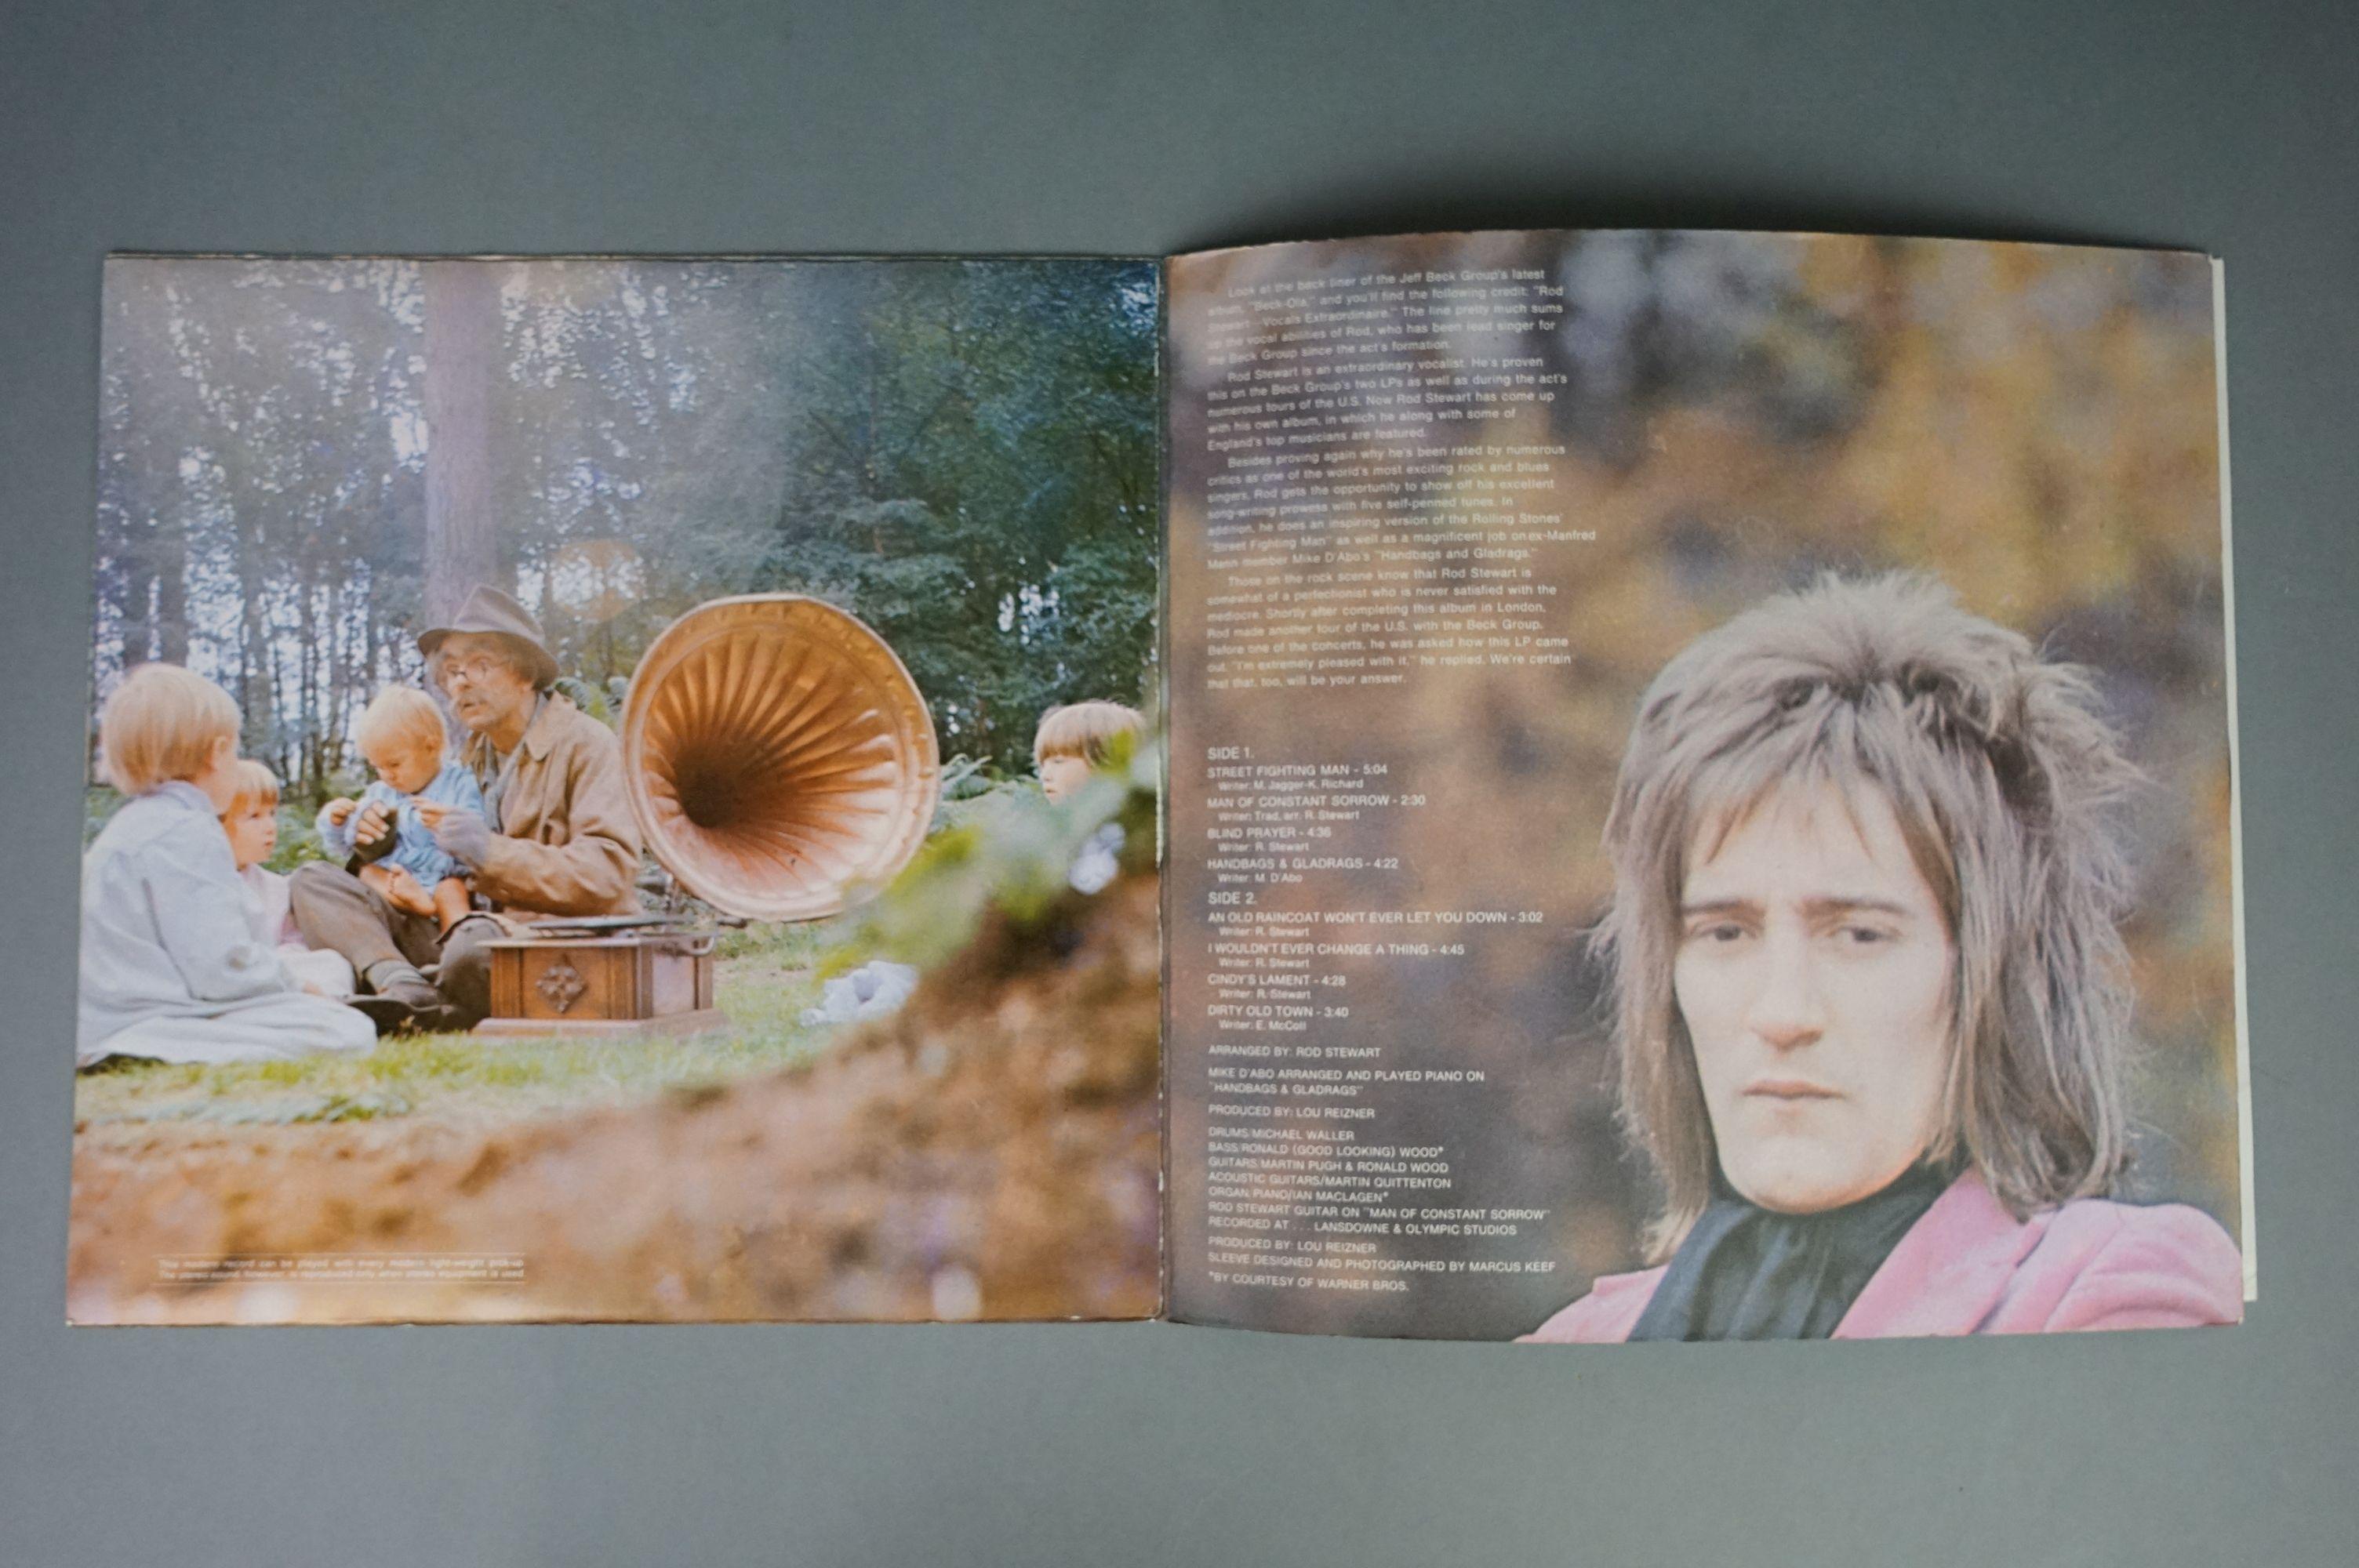 Vinyl - Rod Stewart 4 LP's to include An Old Raincoat Won't Ever Let You Down (Vertigo VO4) gatefold - Image 14 of 14